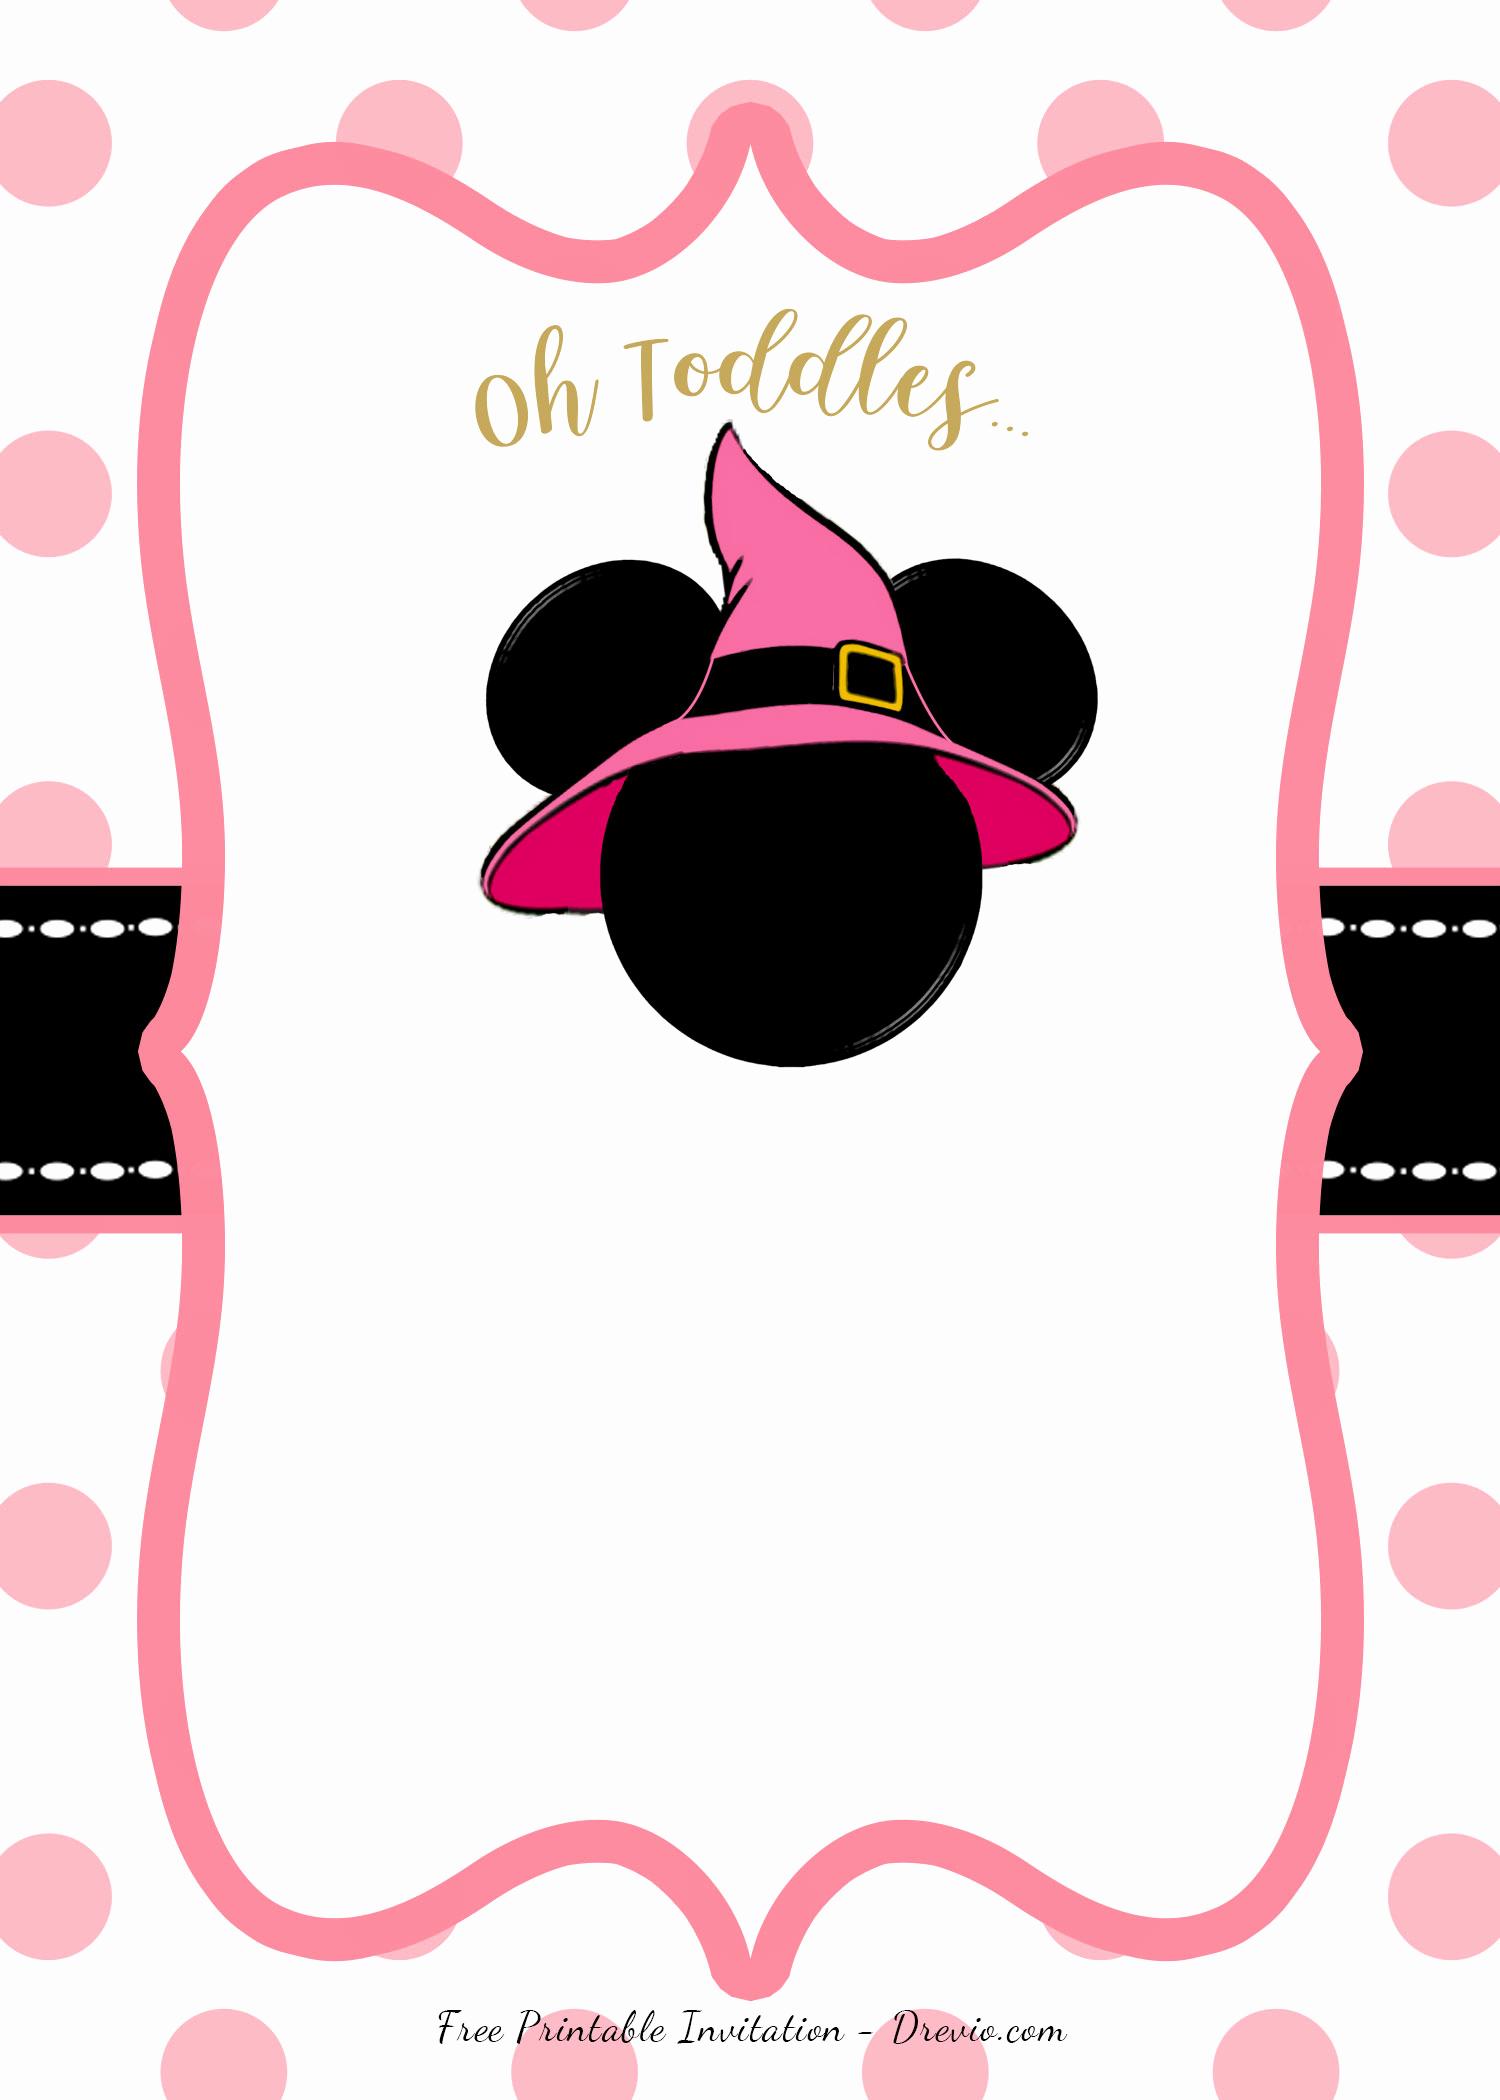 Free Minnie Mouse Invitation Template Beautiful Free Minnie Mouse Head Invitation Templates – Free